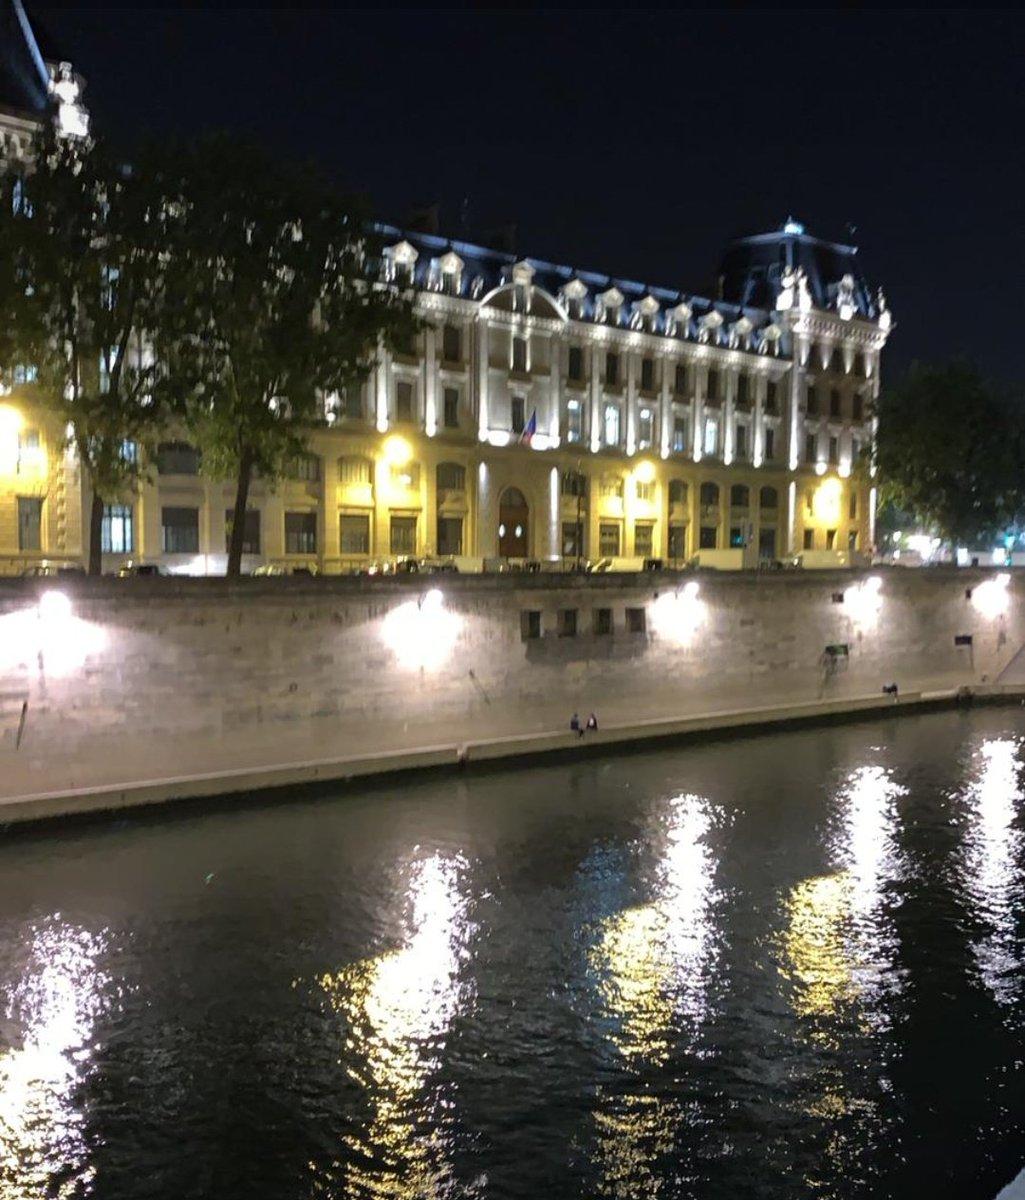 Evening stroll along the river...#Paris #parisjetaime #Travel pic.twitter.com/WornmIWizS